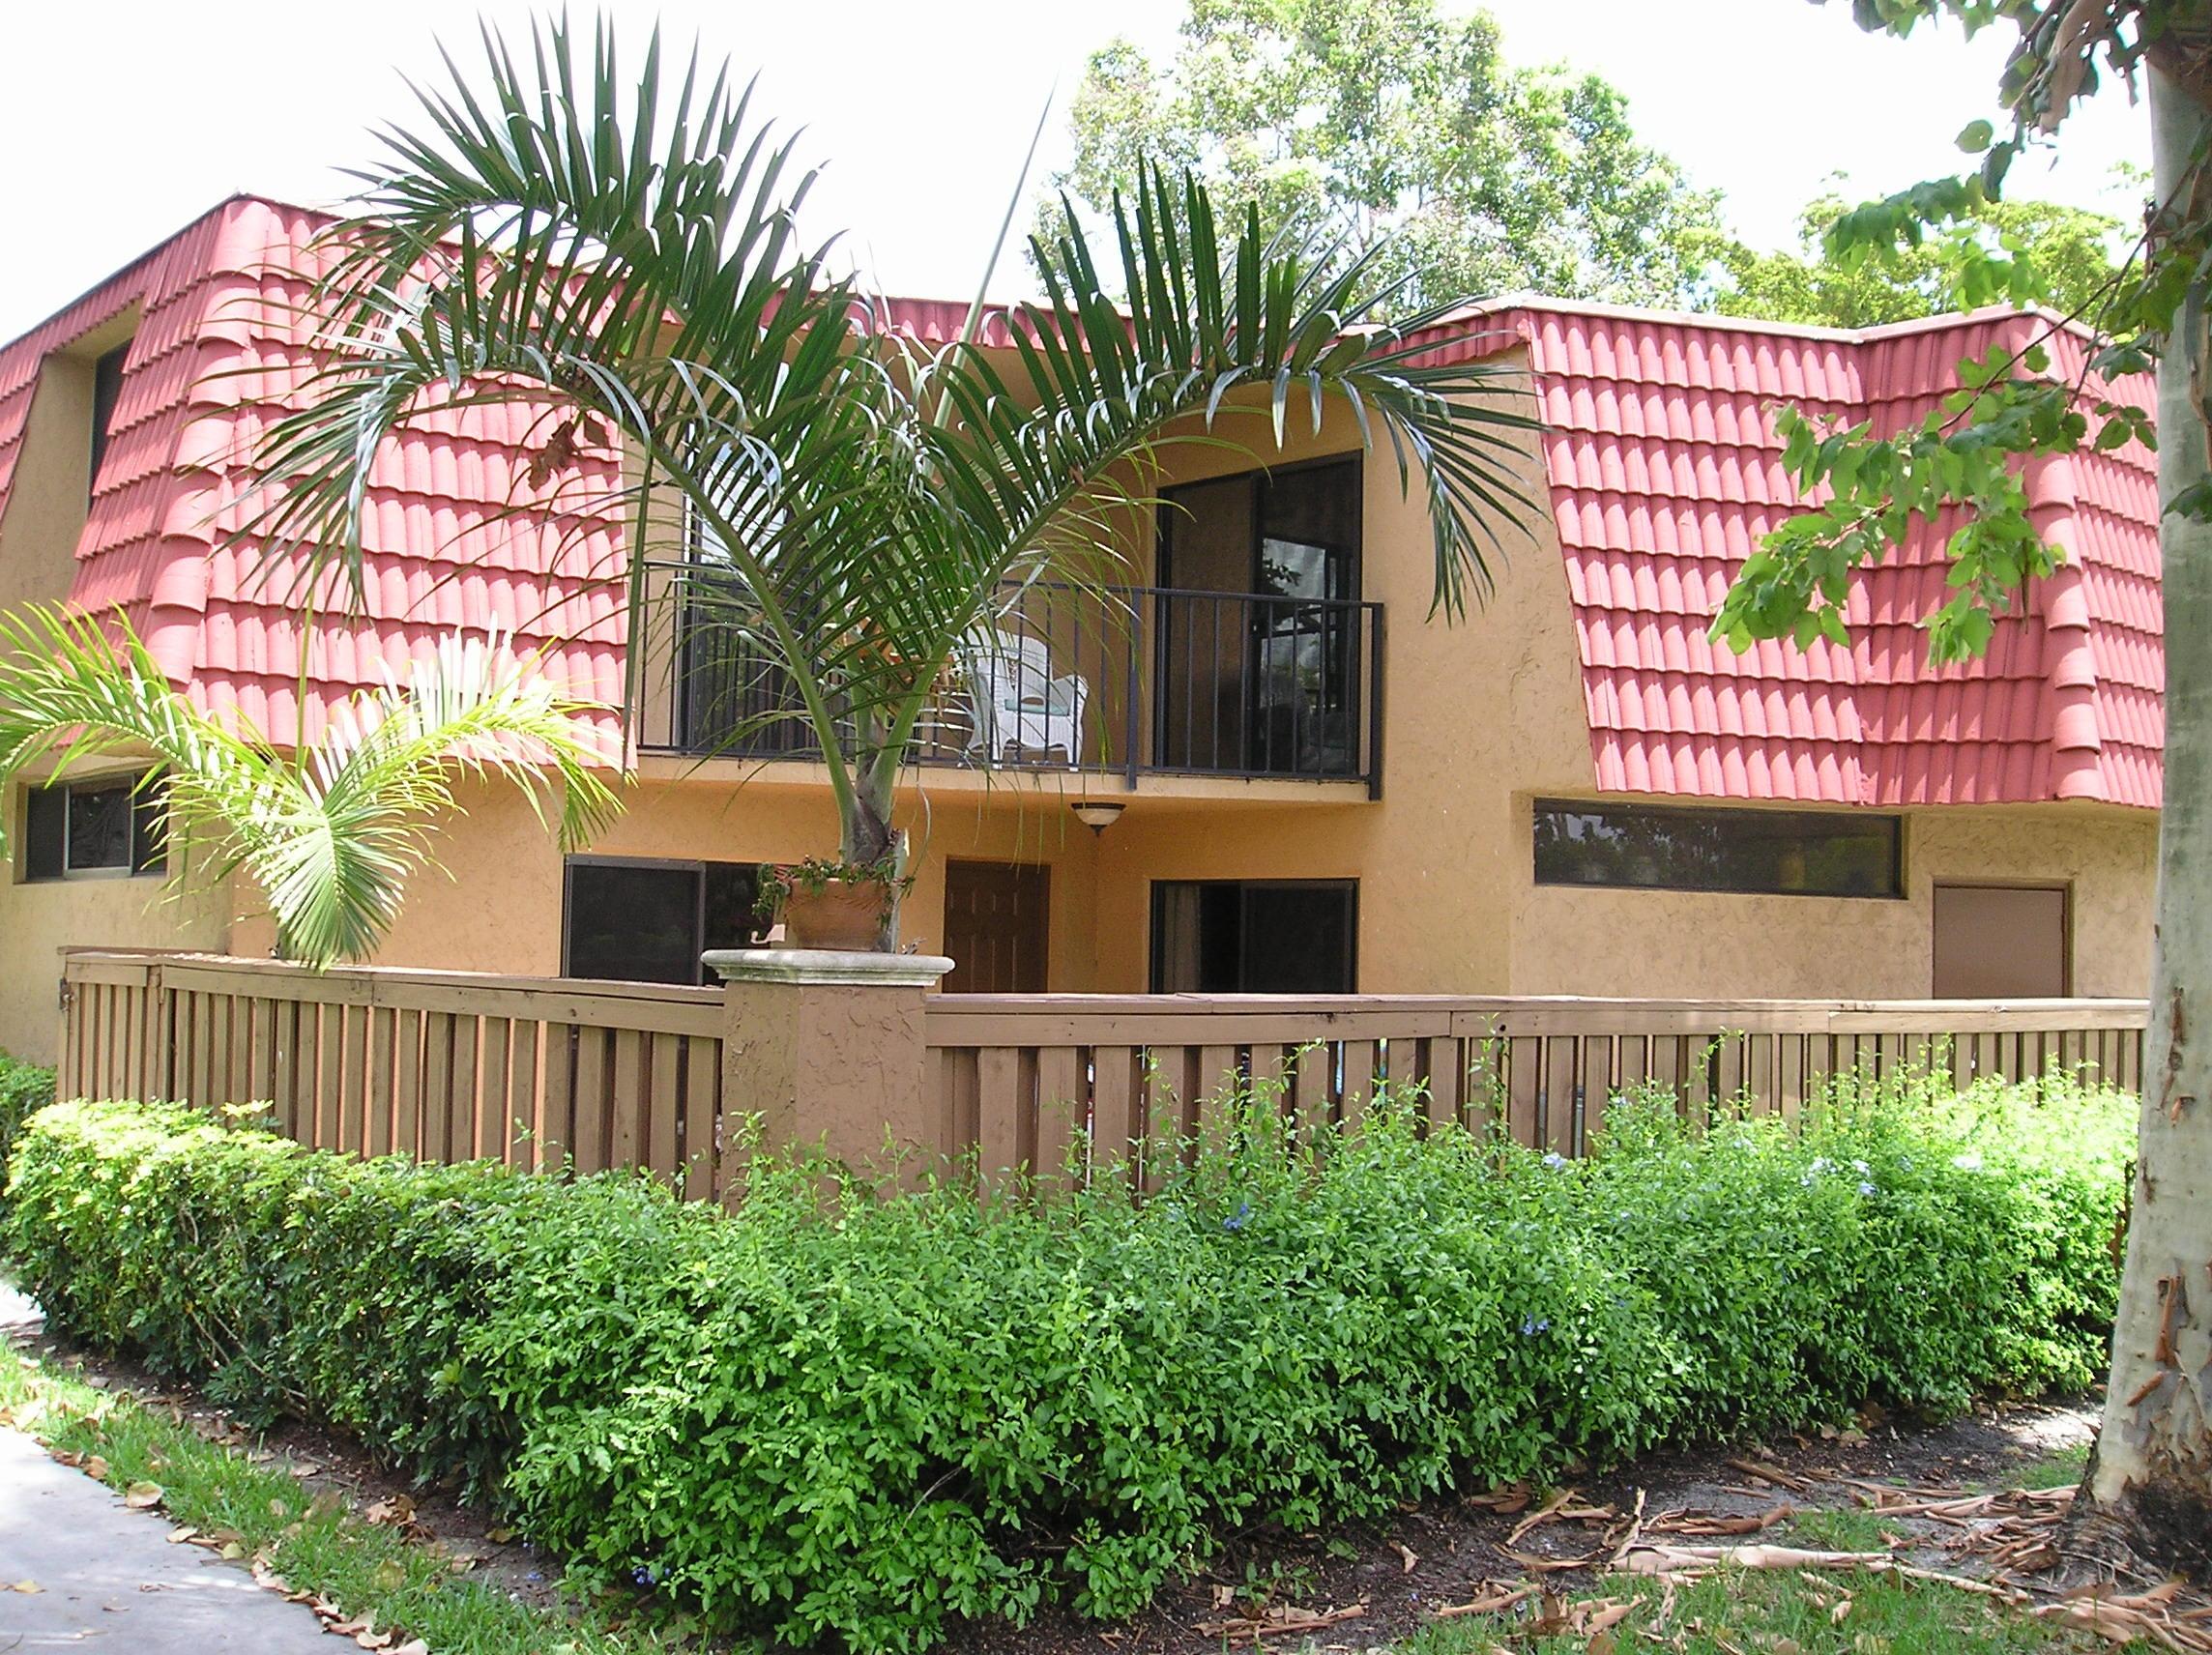 8159 Severn Drive - 2/2 in BOCA RIO NORTH / Banyan Lakes / Bermuda Isles